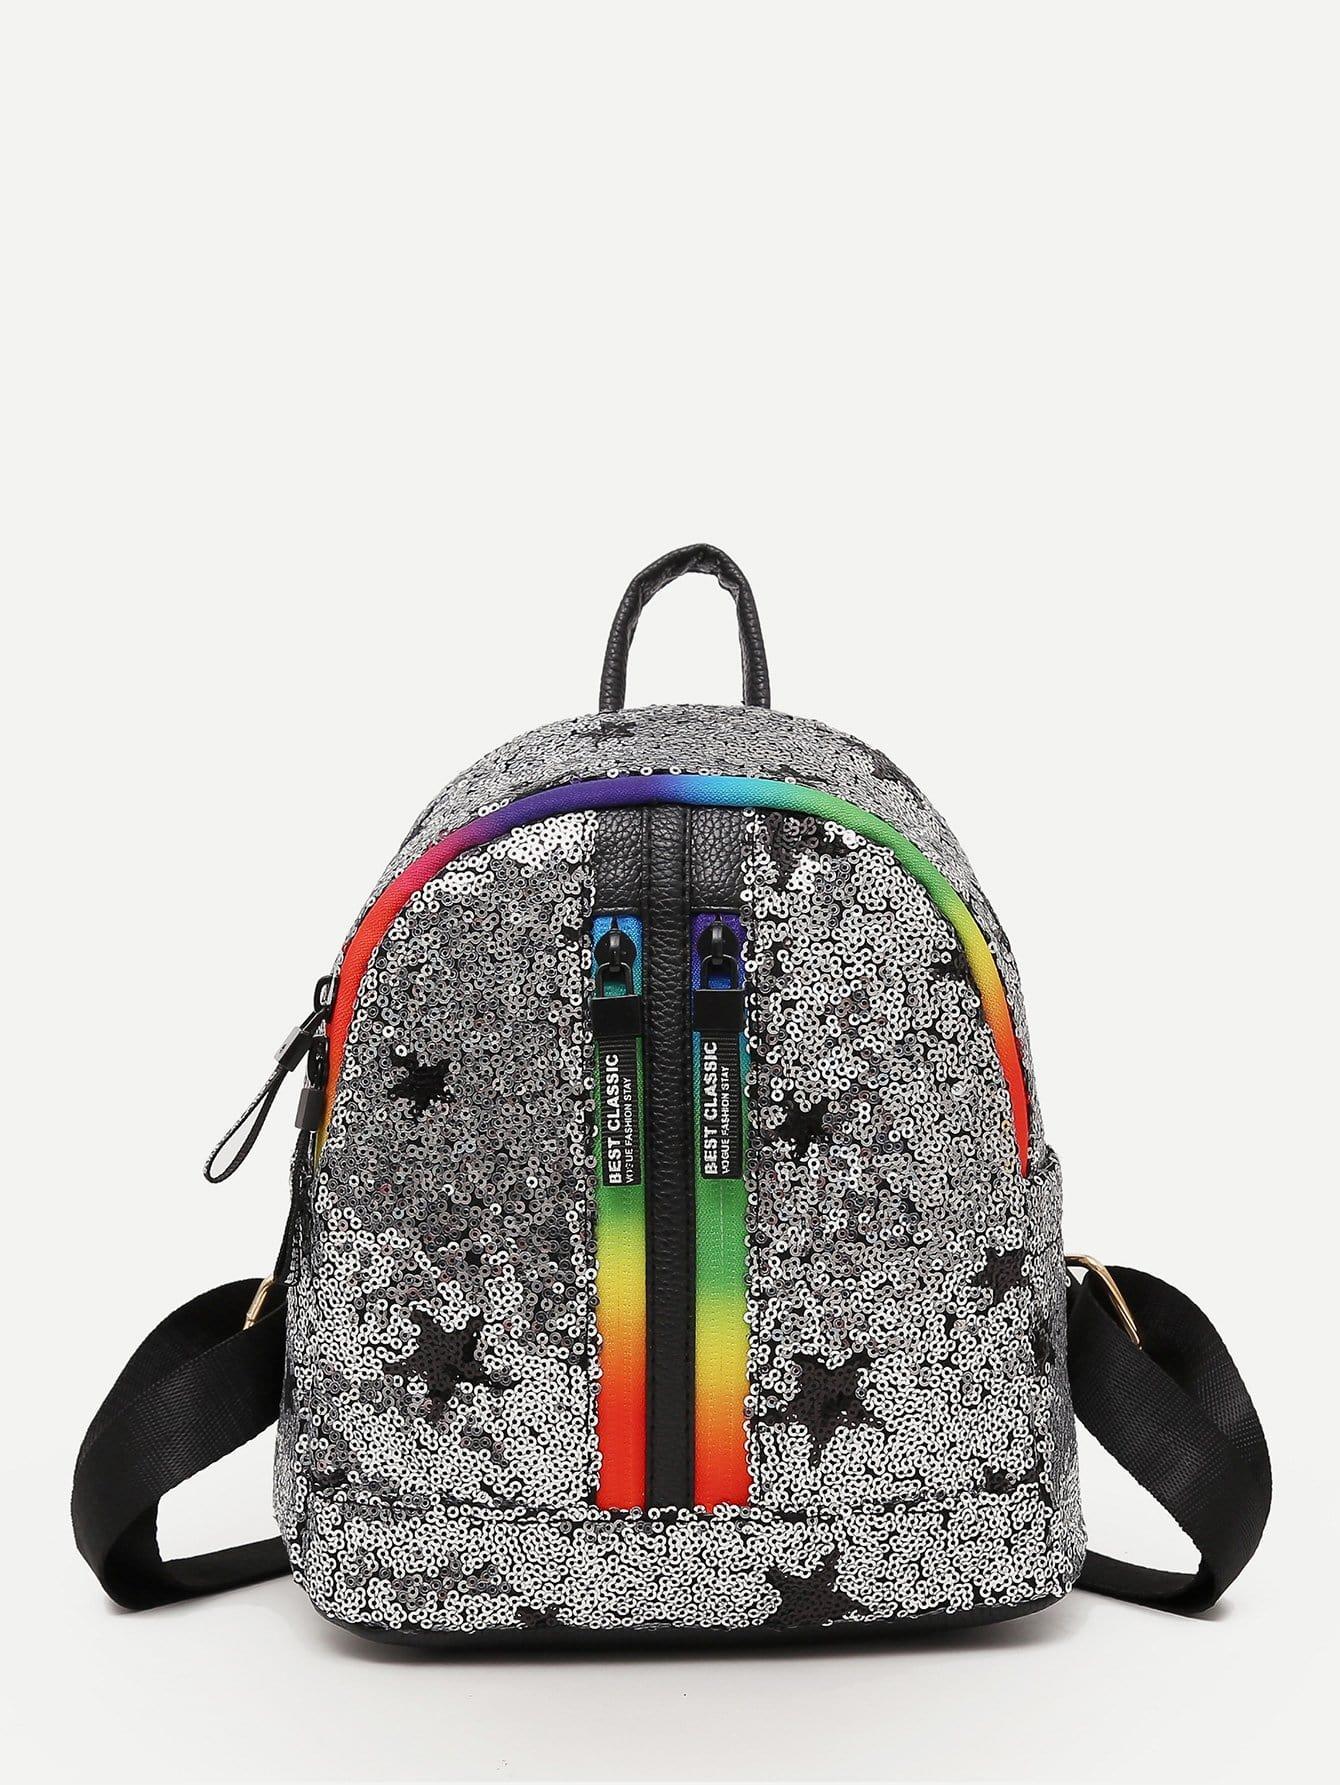 Sequin Decor Star Backpack